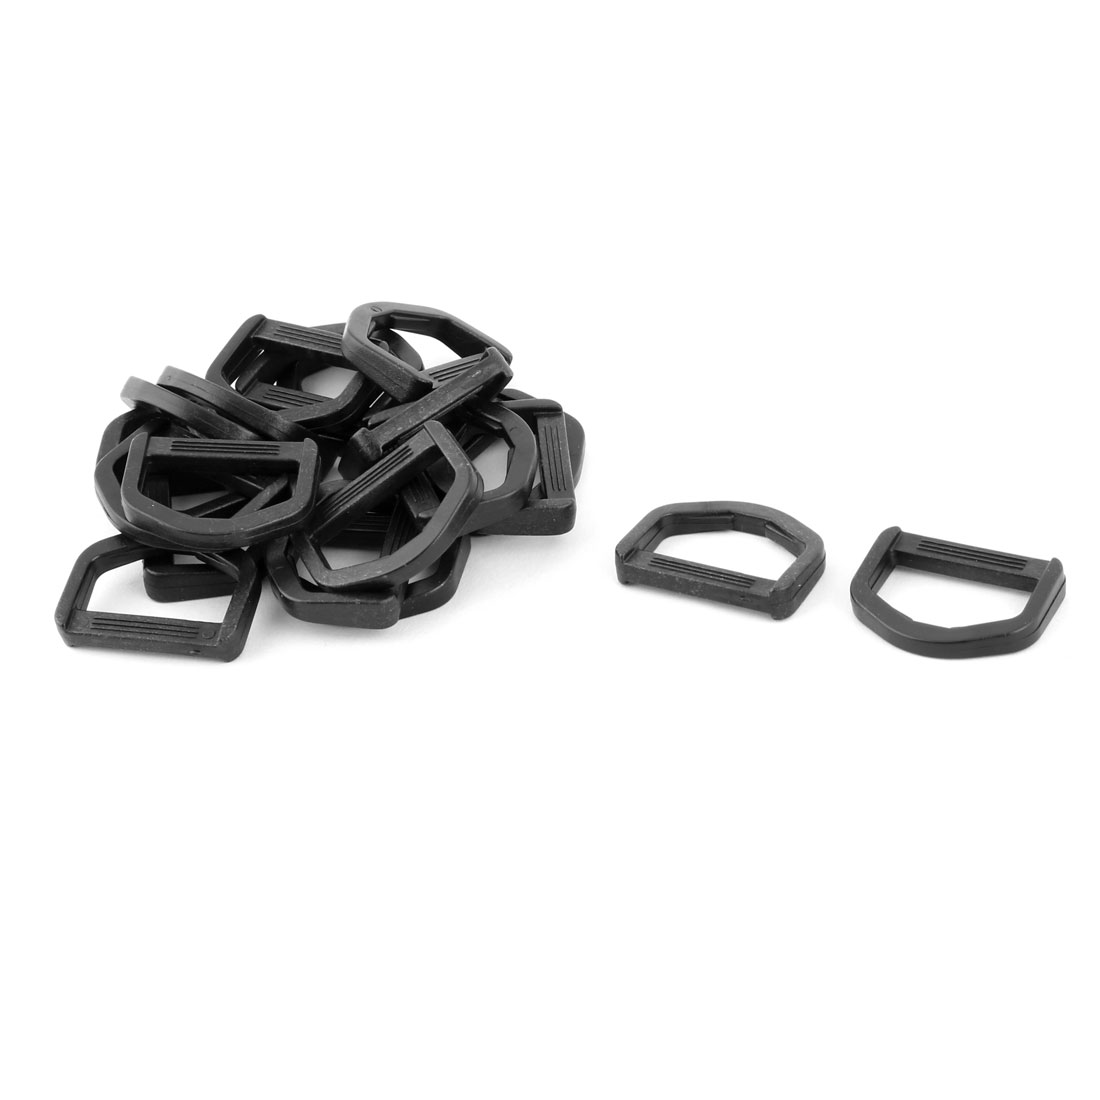 Backpack Plastic D Shaped Webbing Belt Strap Connecting Ring Buckle Black 20pcs